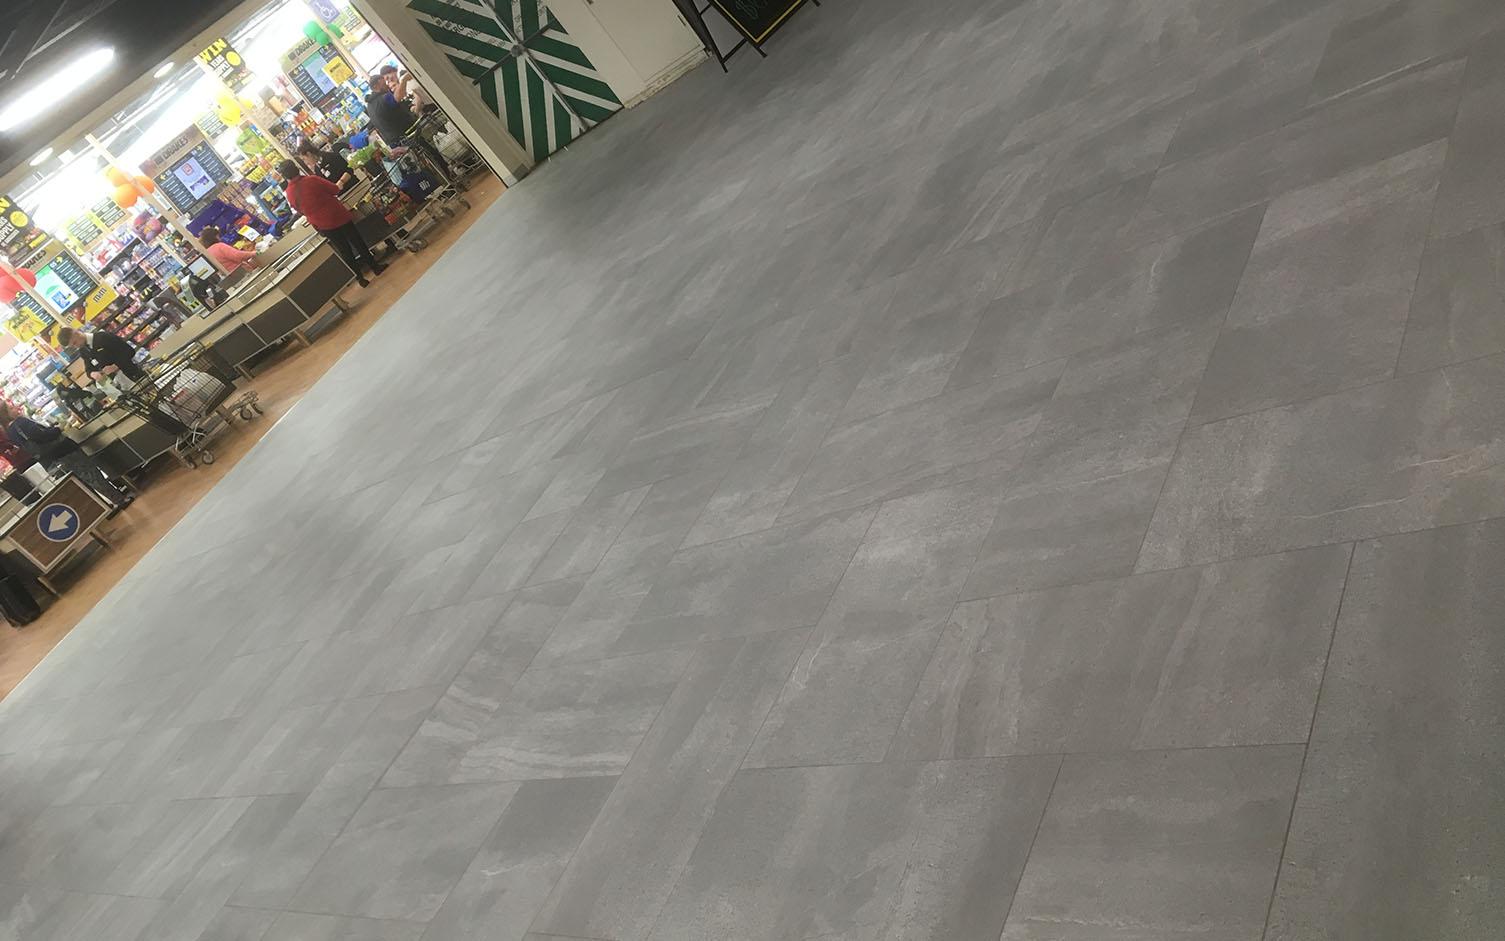 https://ggtiling.com.au/wp-content/uploads/2018/11/G-and-G-Tiling-Golden-Grove-Shopping-Centre_0013_14.jpg